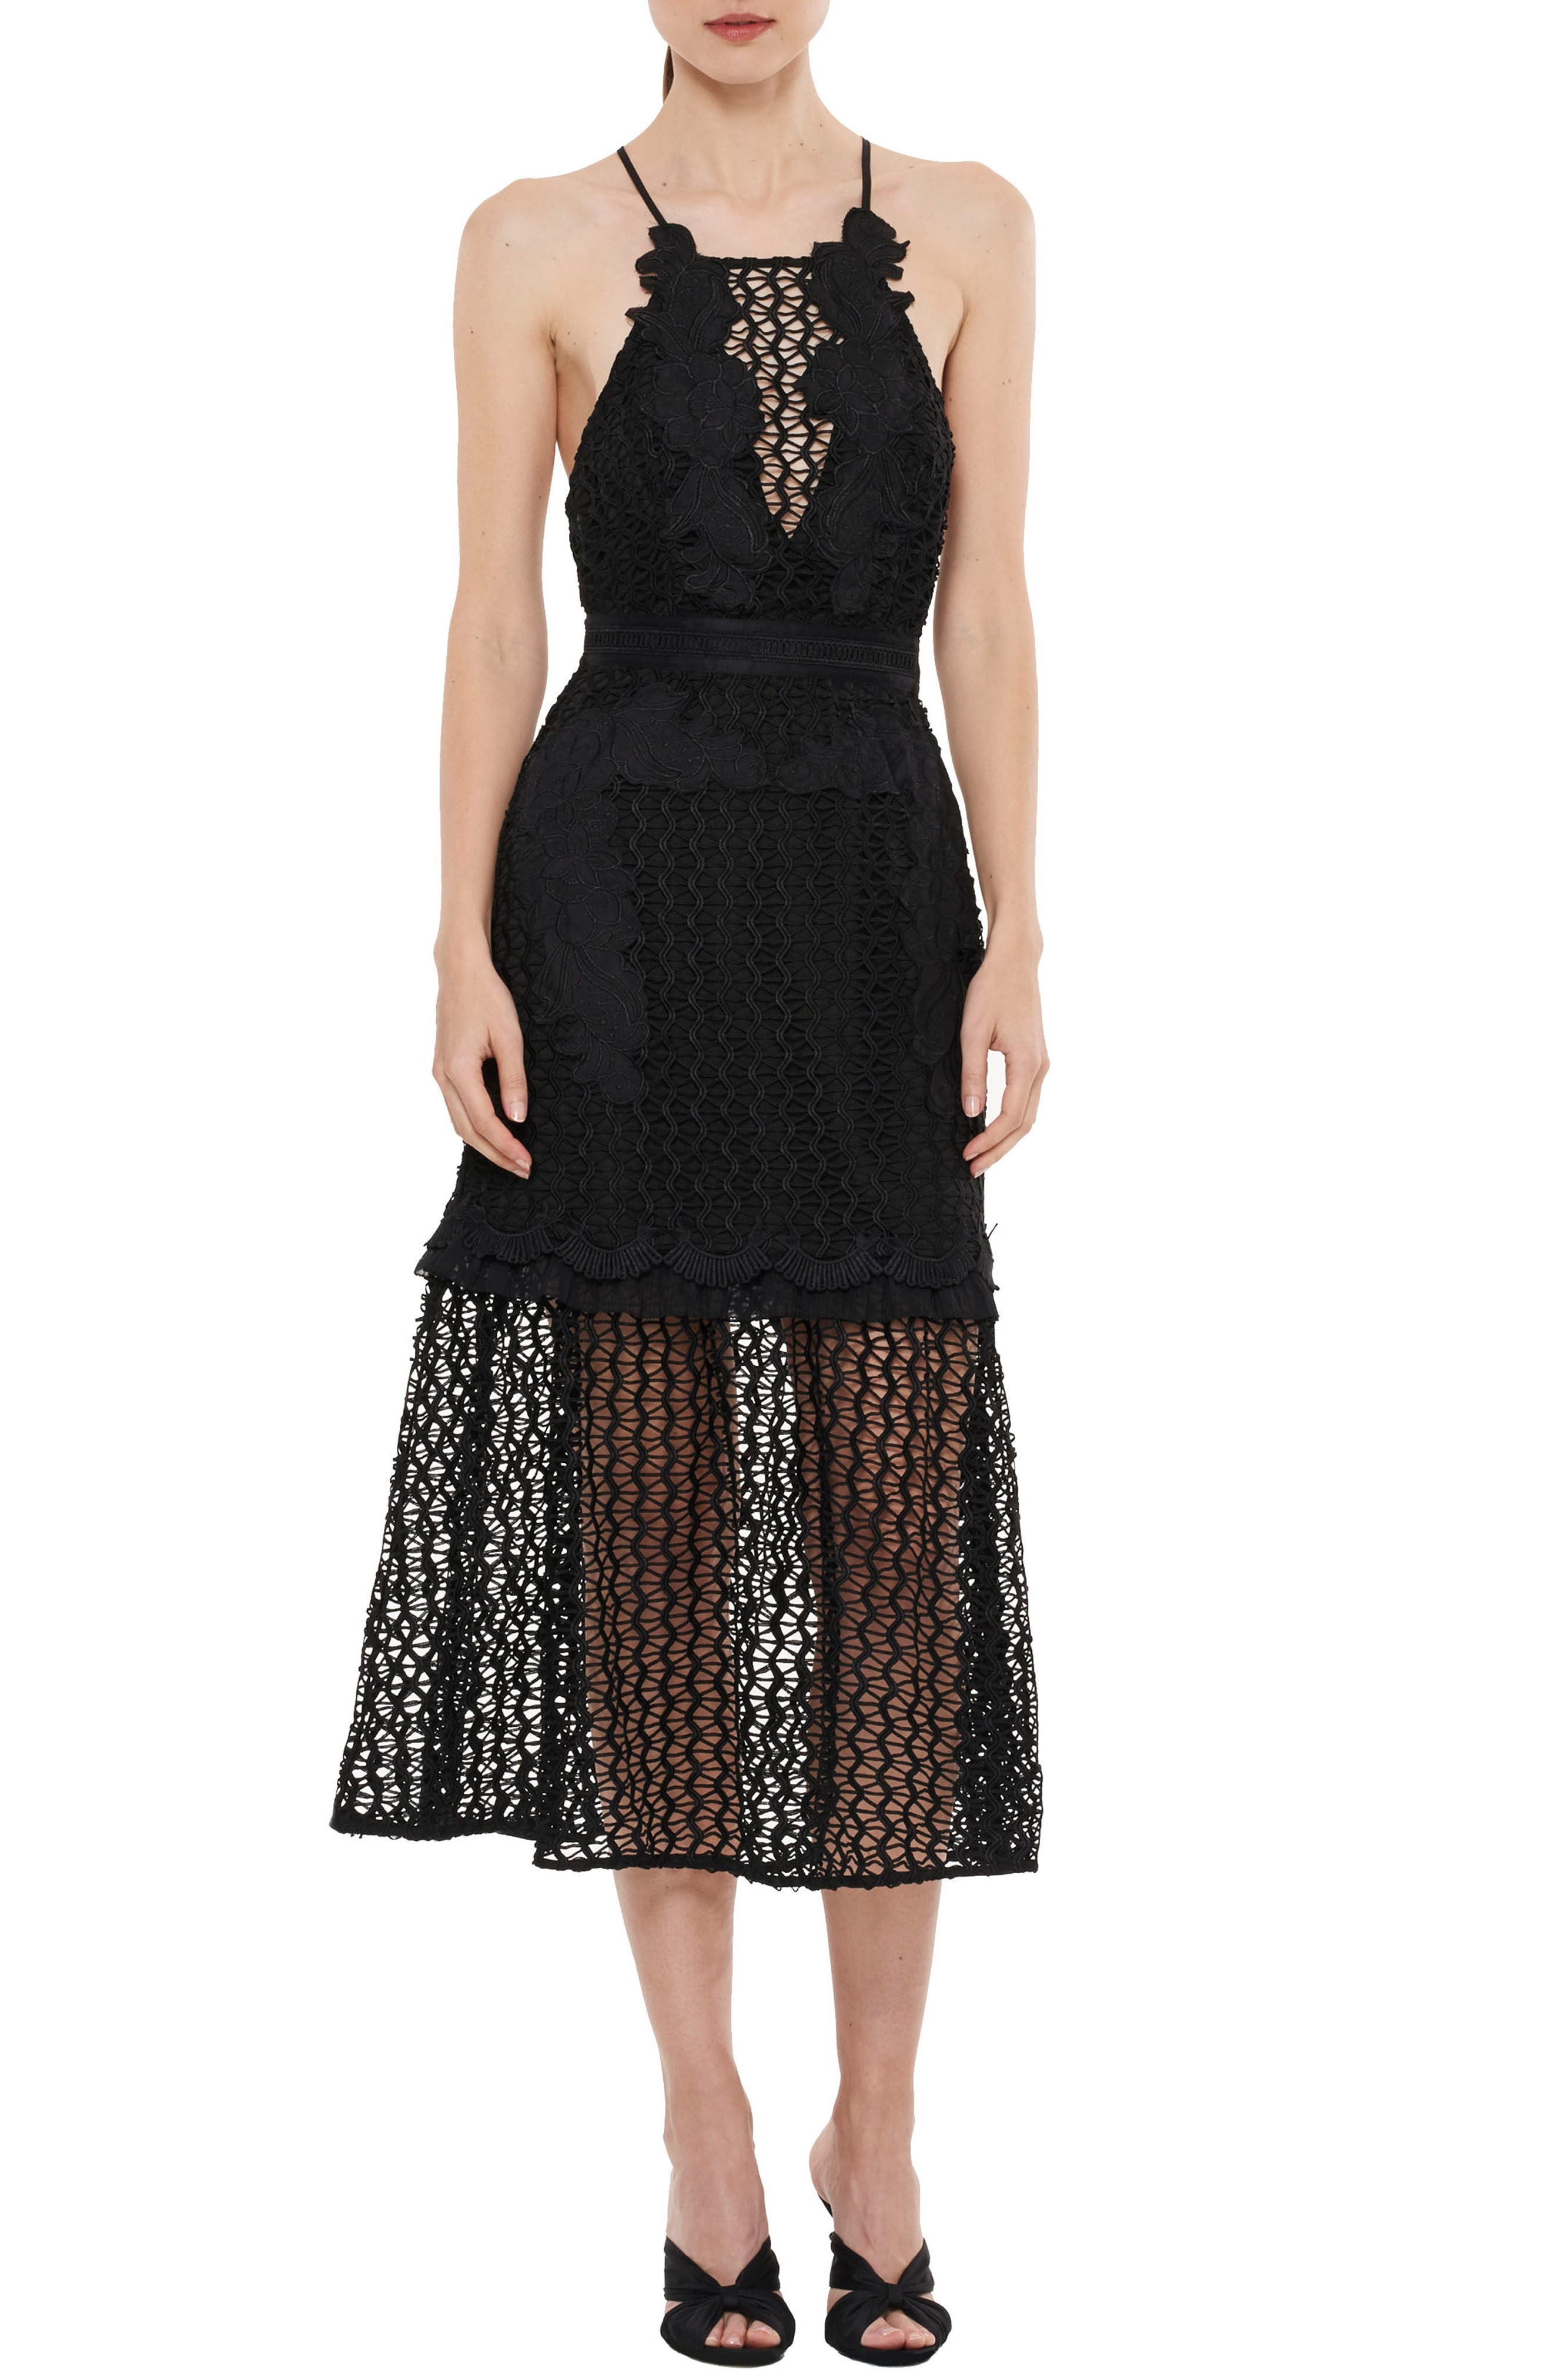 Sweet Dreams Crochet A-Line Dress,                         Main,                         color, 001